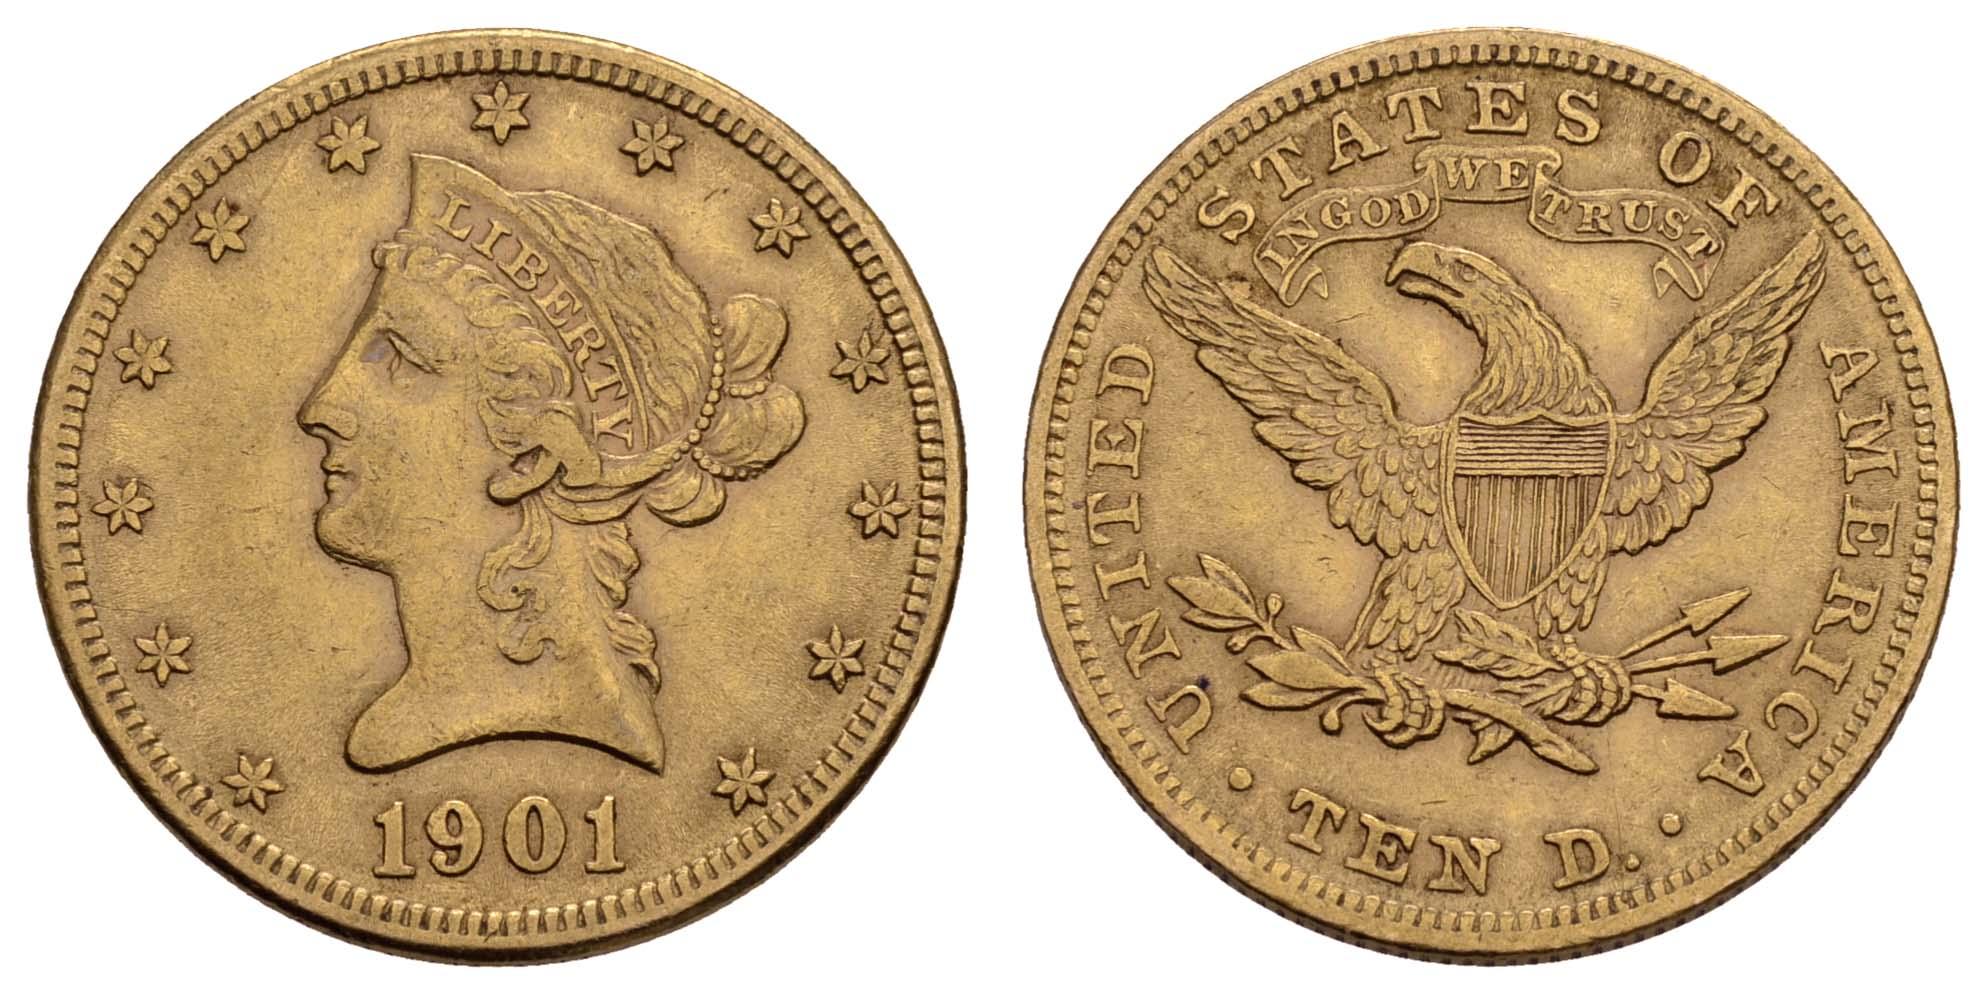 Lot 2152 - übersee usa -  Auktionshaus Ulrich Felzmann GmbH & Co. KG Coins single lots